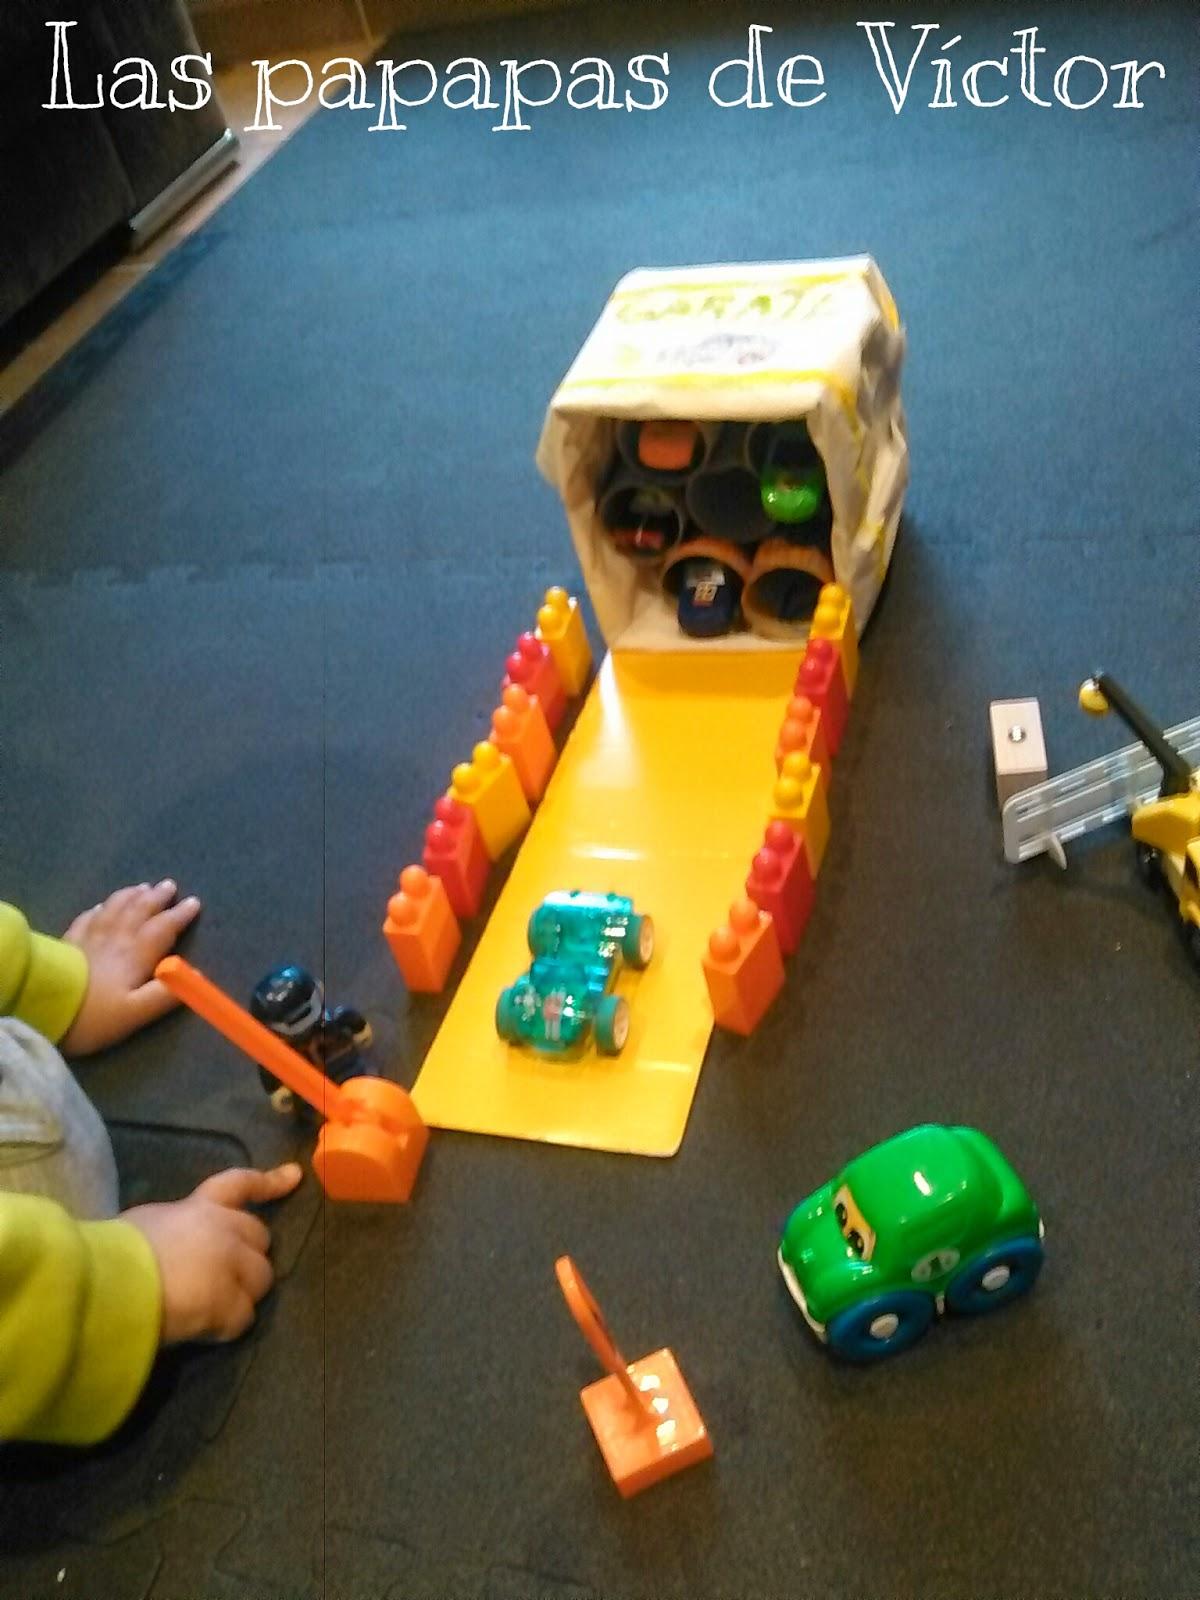 Las papapas de v ctor garaje para coches - Garaje para coches ...